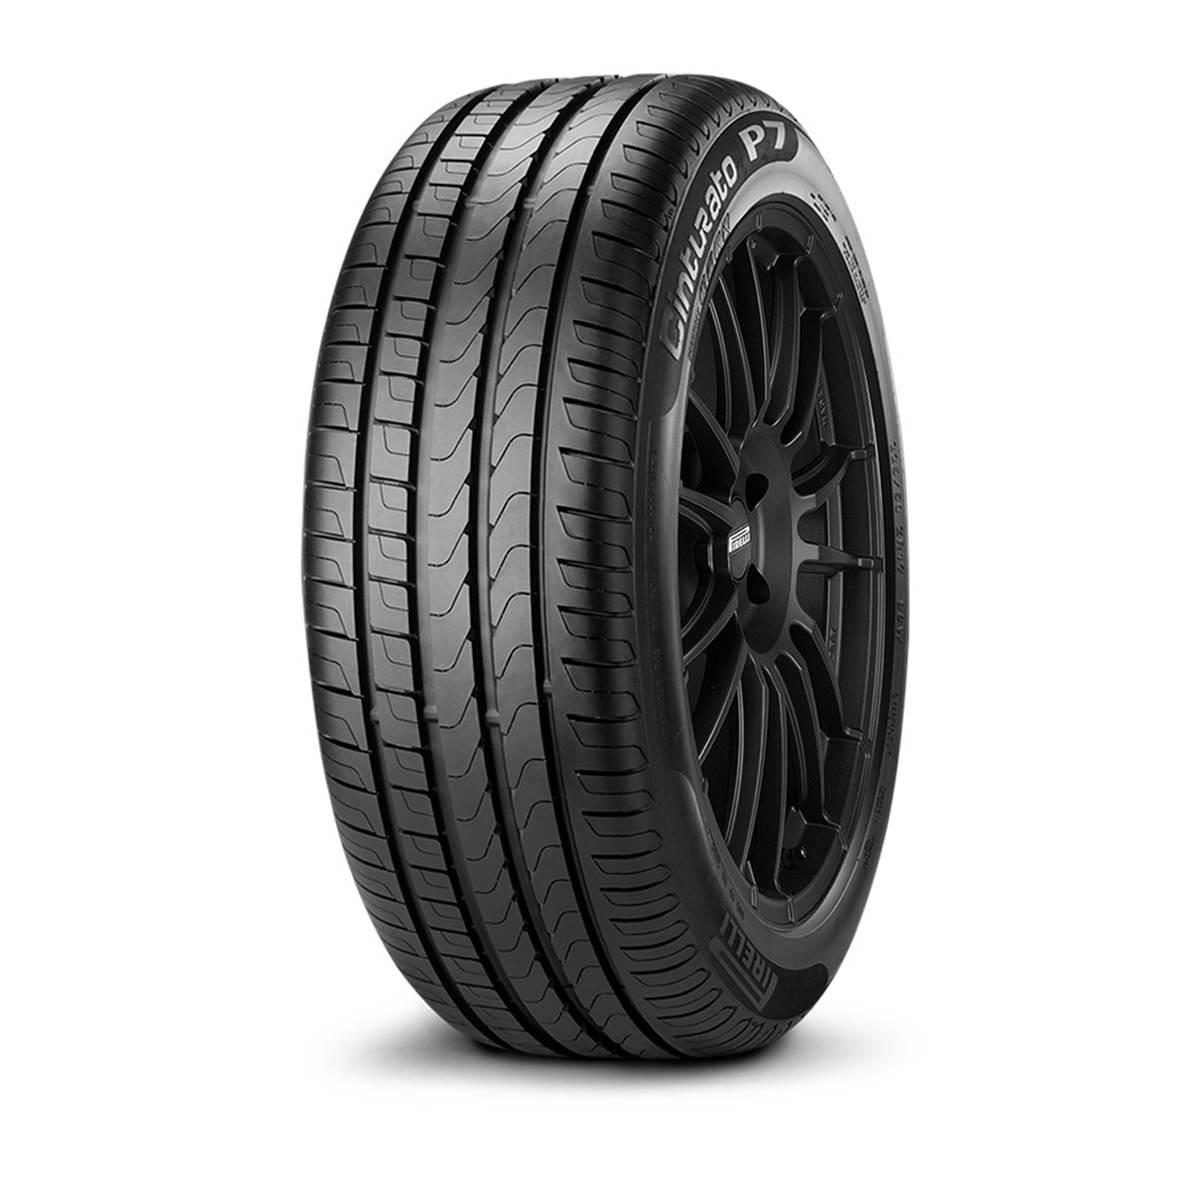 Pneu Pirelli 215/50R17 91W Cinturato P7